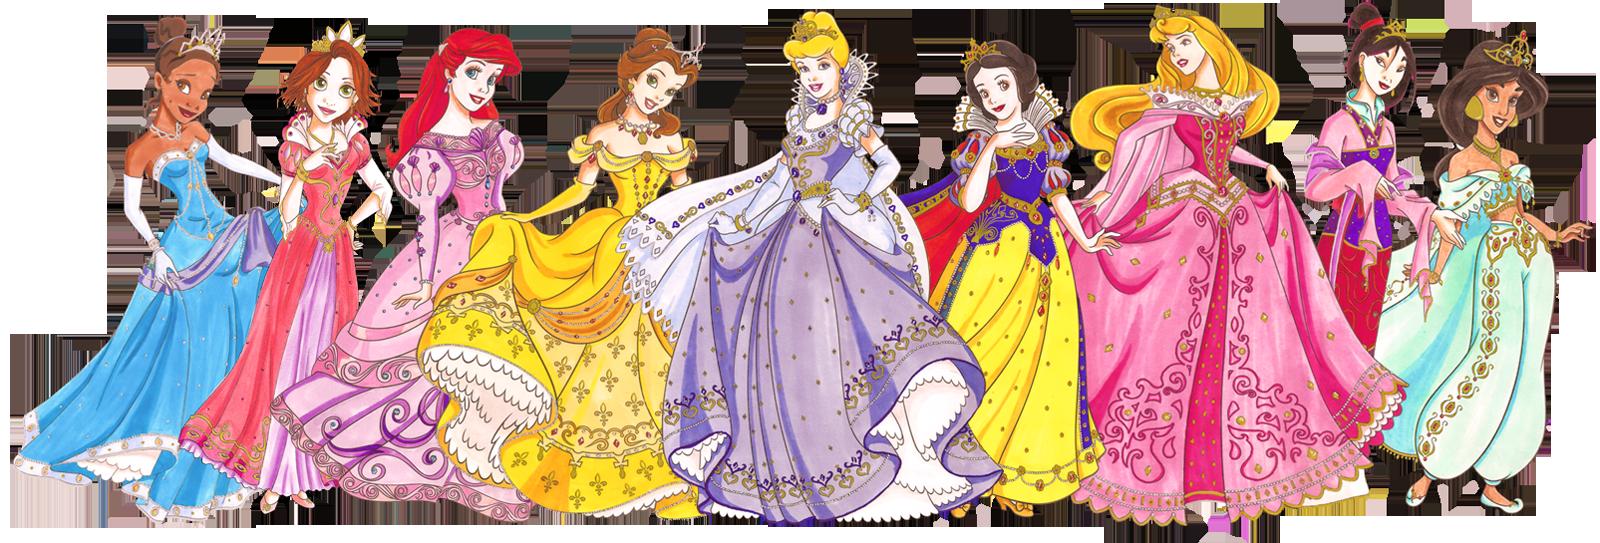 Drawn princess collage Princesses Princesses  Clipart Drawn